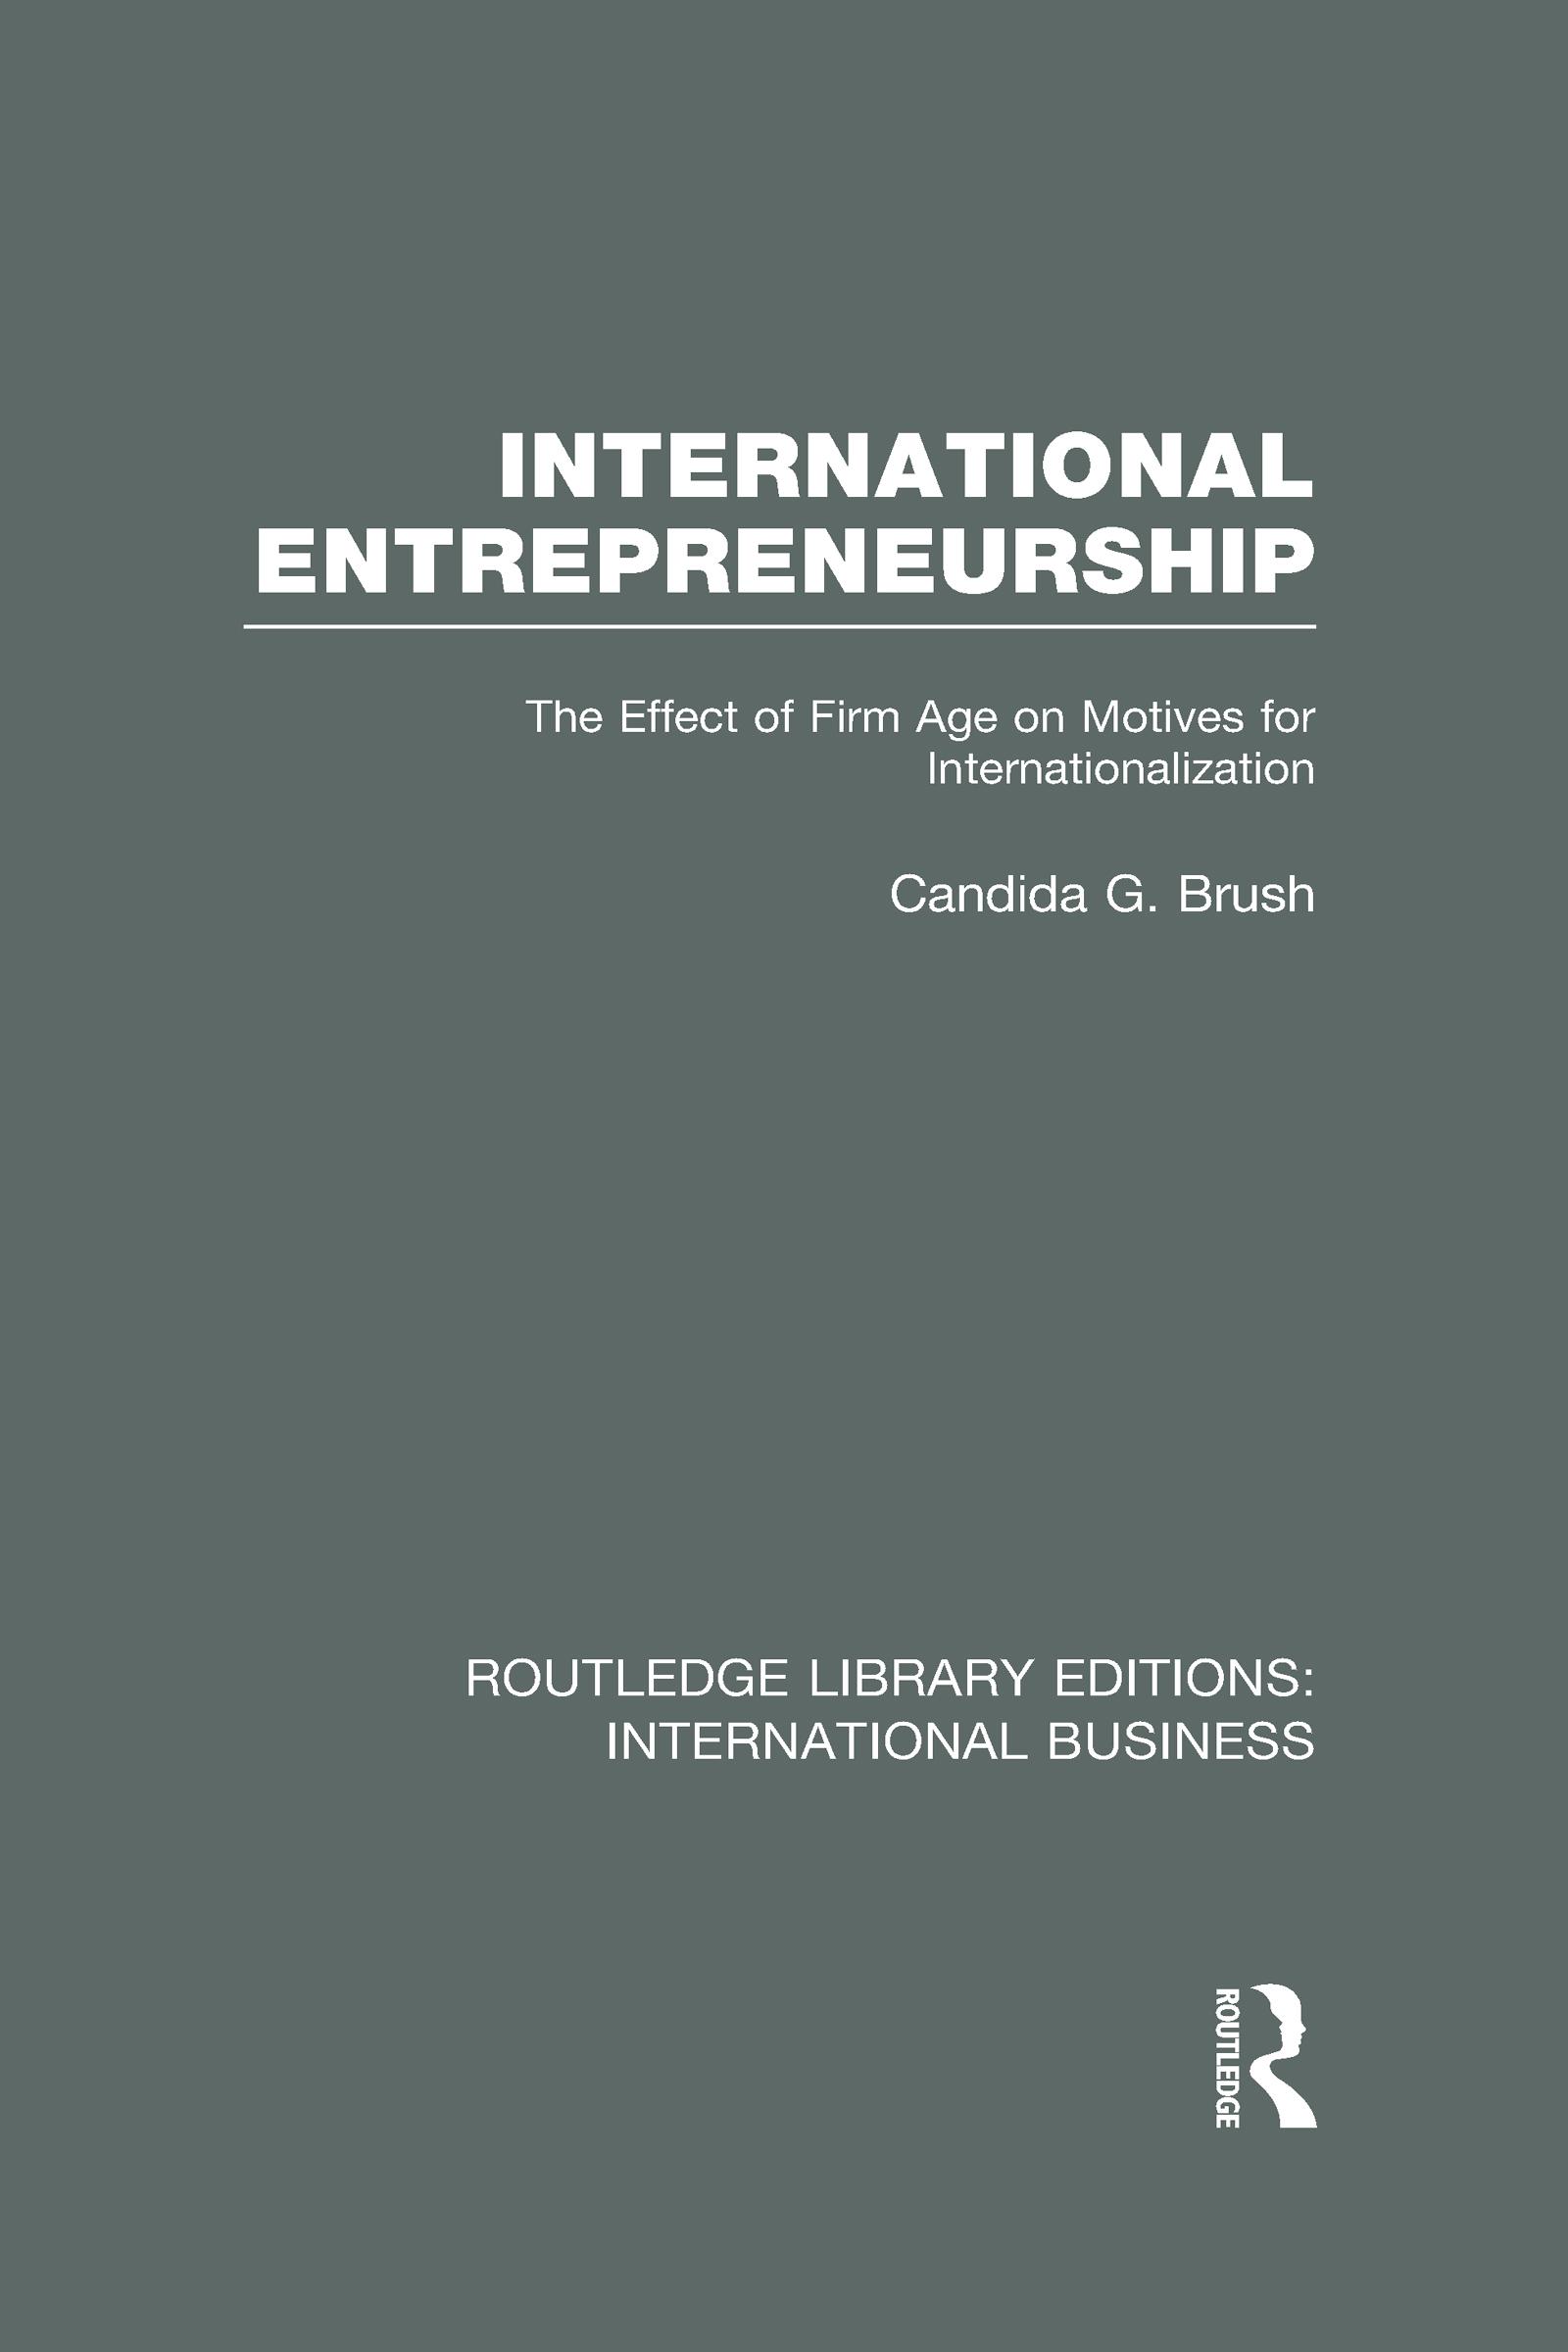 International Entrepreneurship (RLE International Business): The Effect of Firm Age on Motives for Internationalization (Hardback) book cover